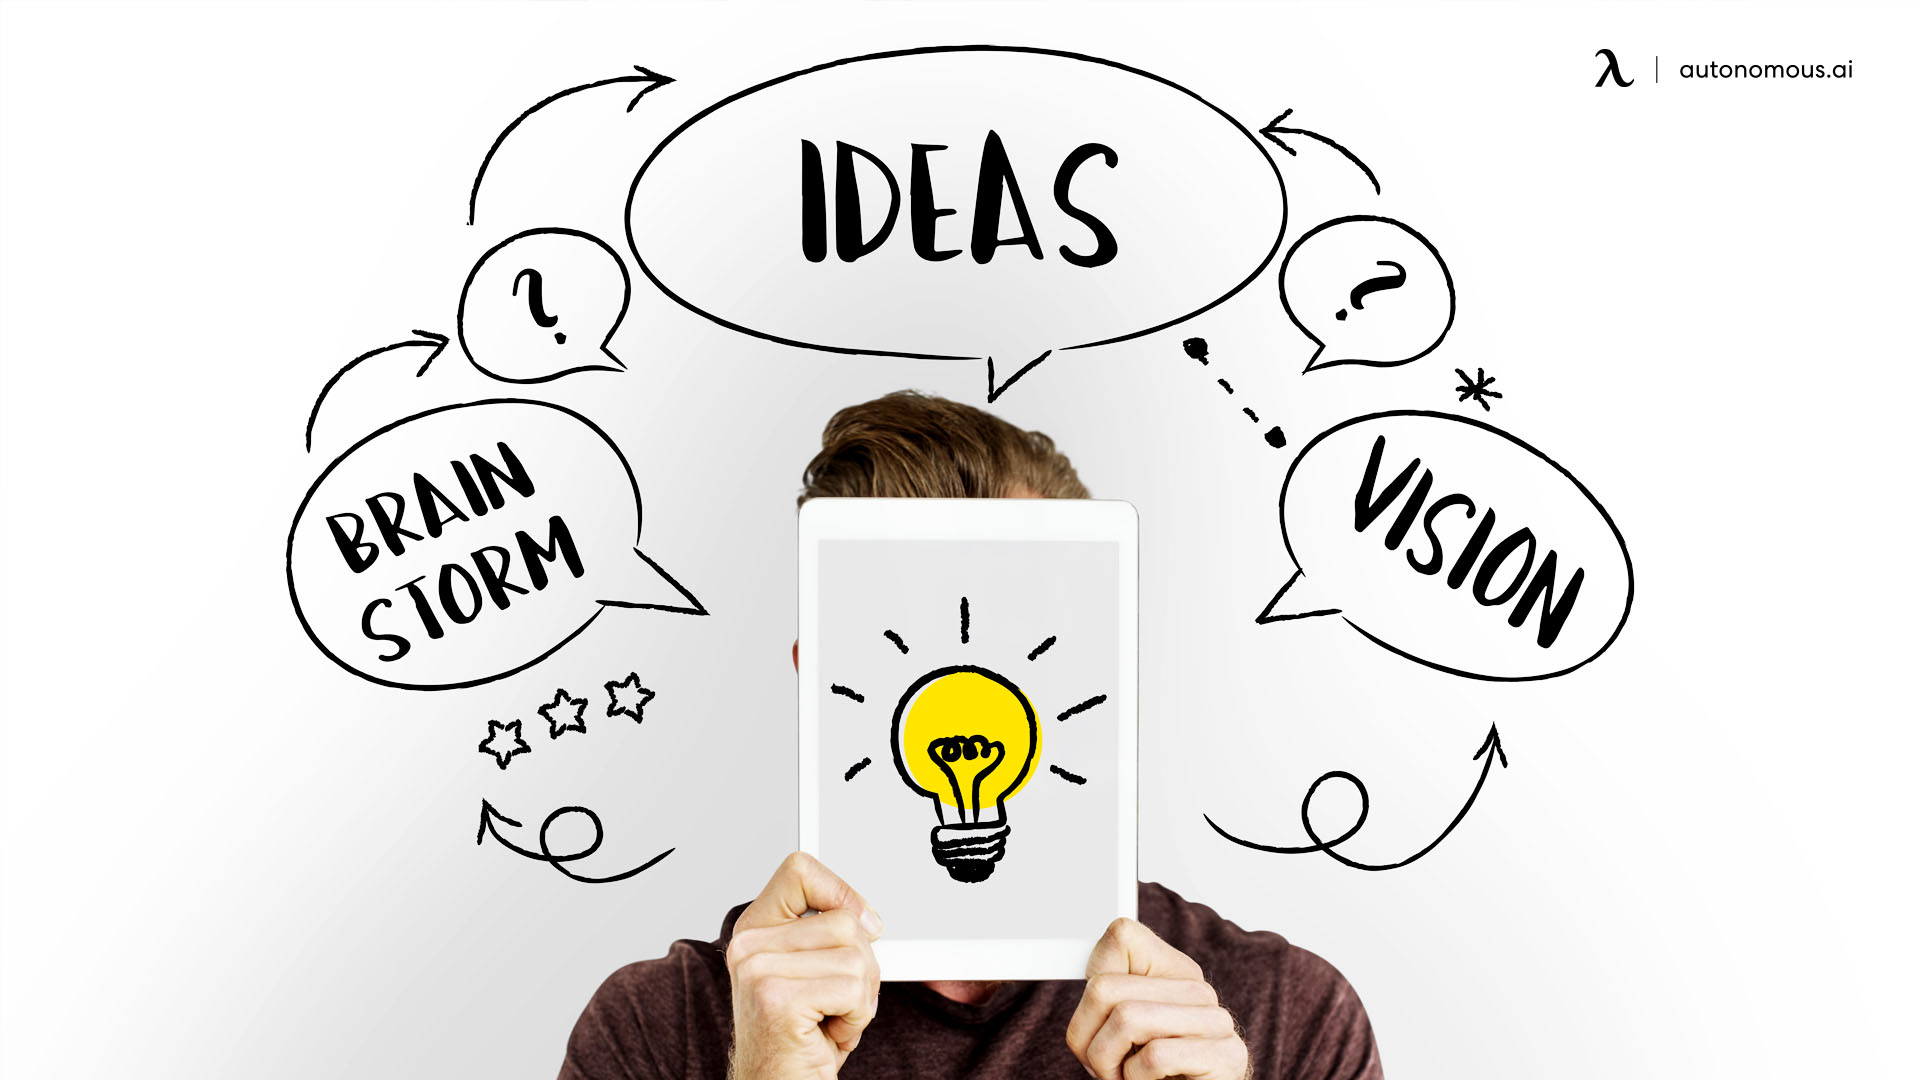 Encourages creative block